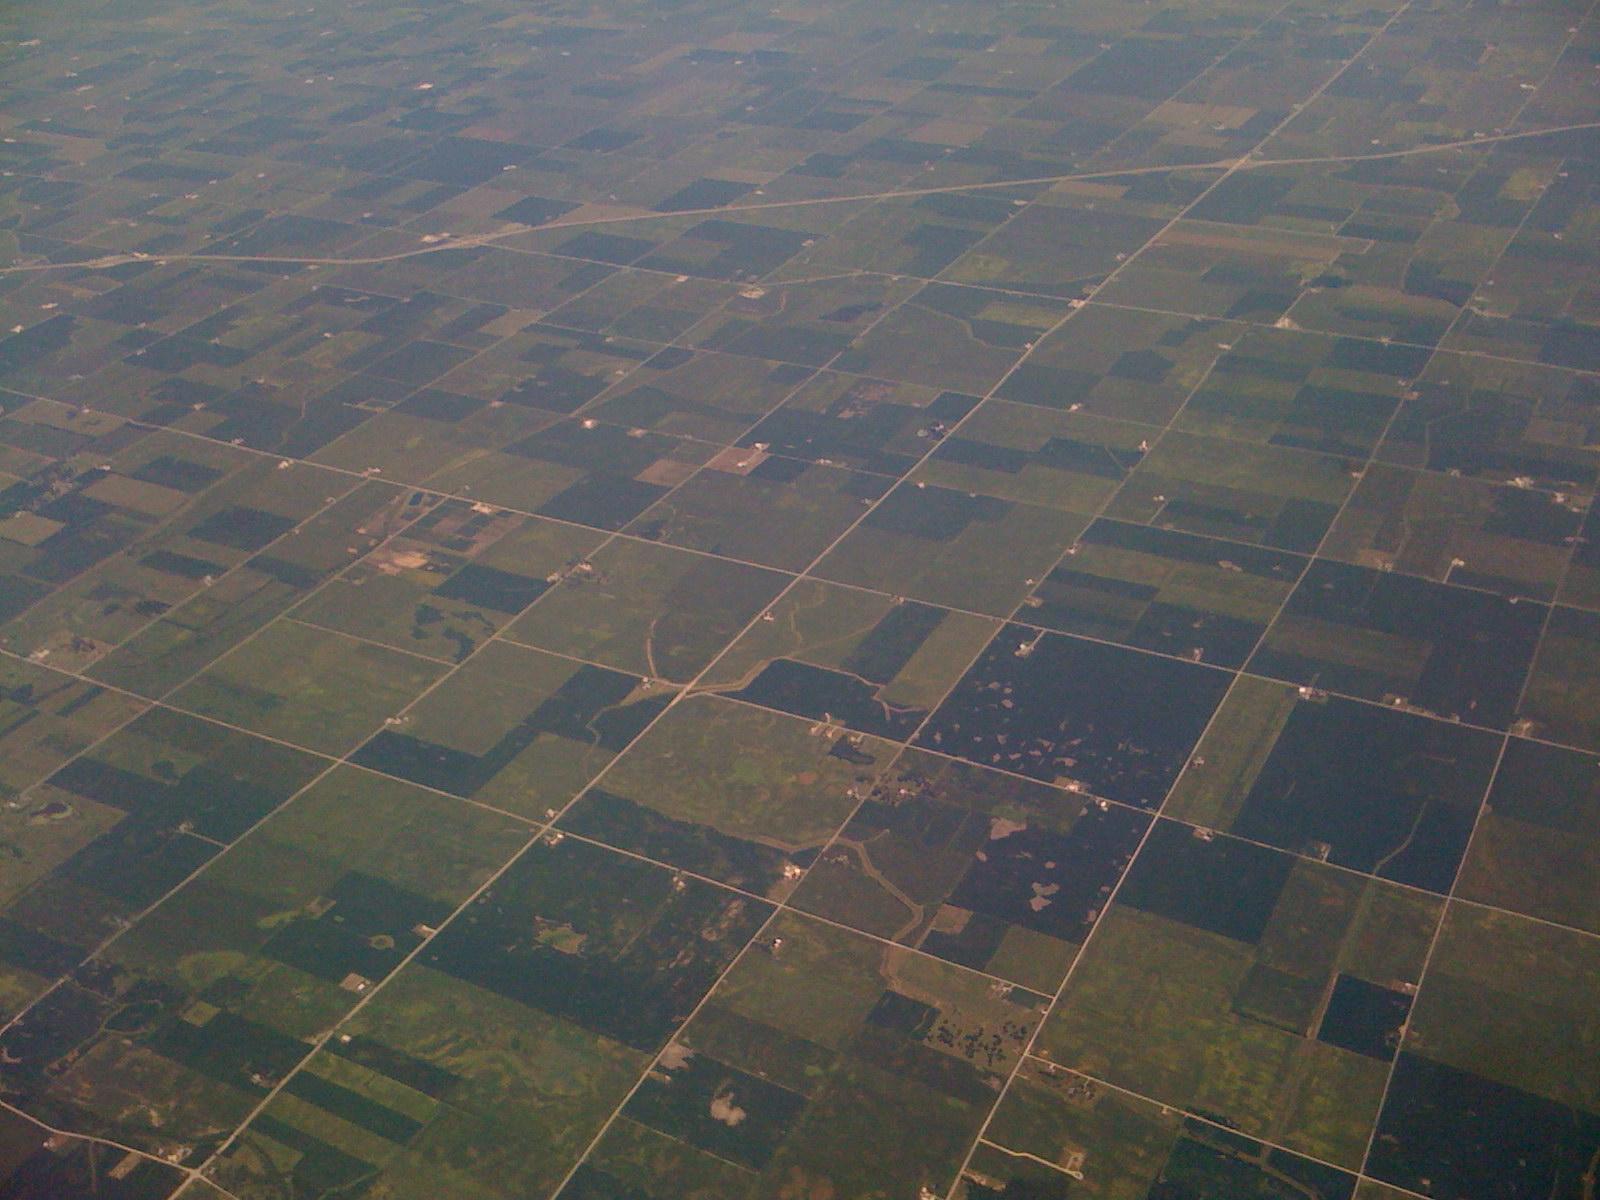 https://upload.wikimedia.org/wikipedia/commons/9/94/Indy_farmland.jpg